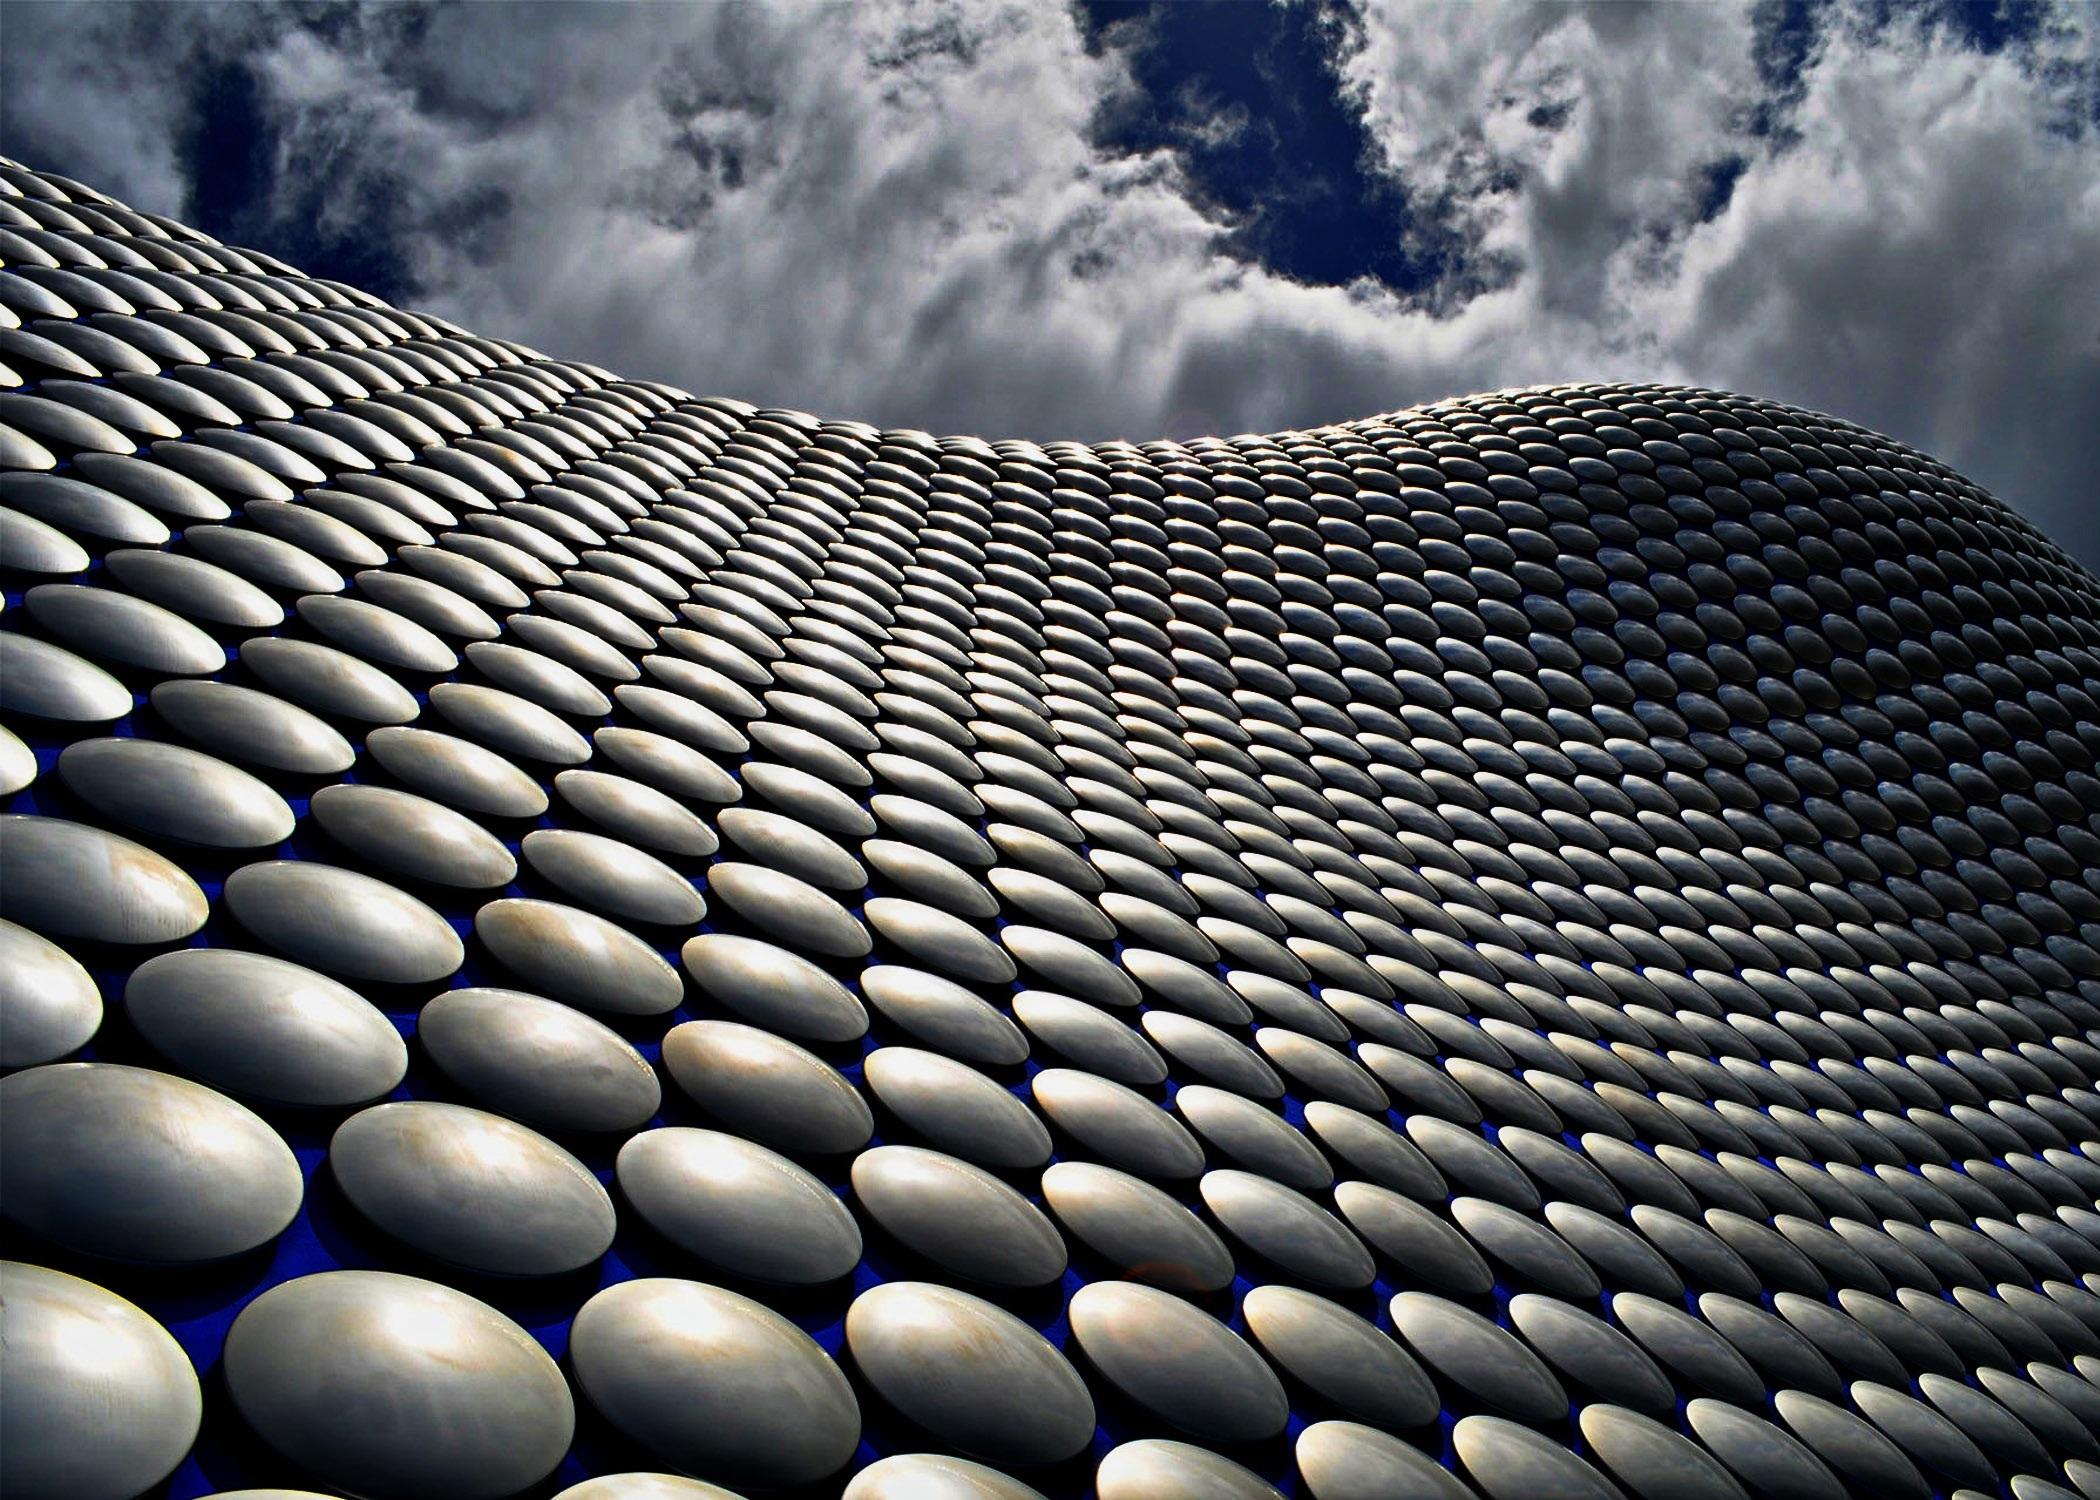 Skin building, architecture, metal, circles, skin, scales, design